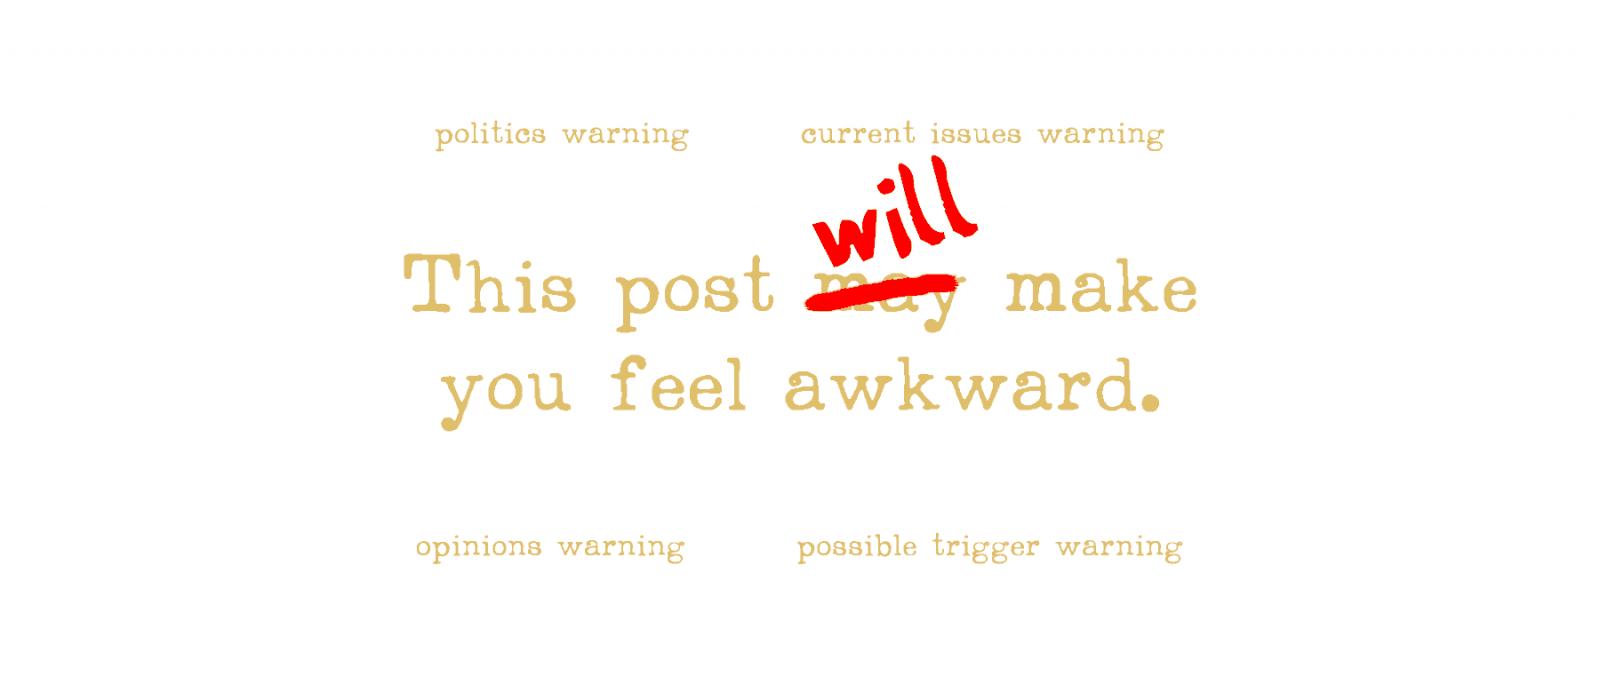 This post will make you feel awkward